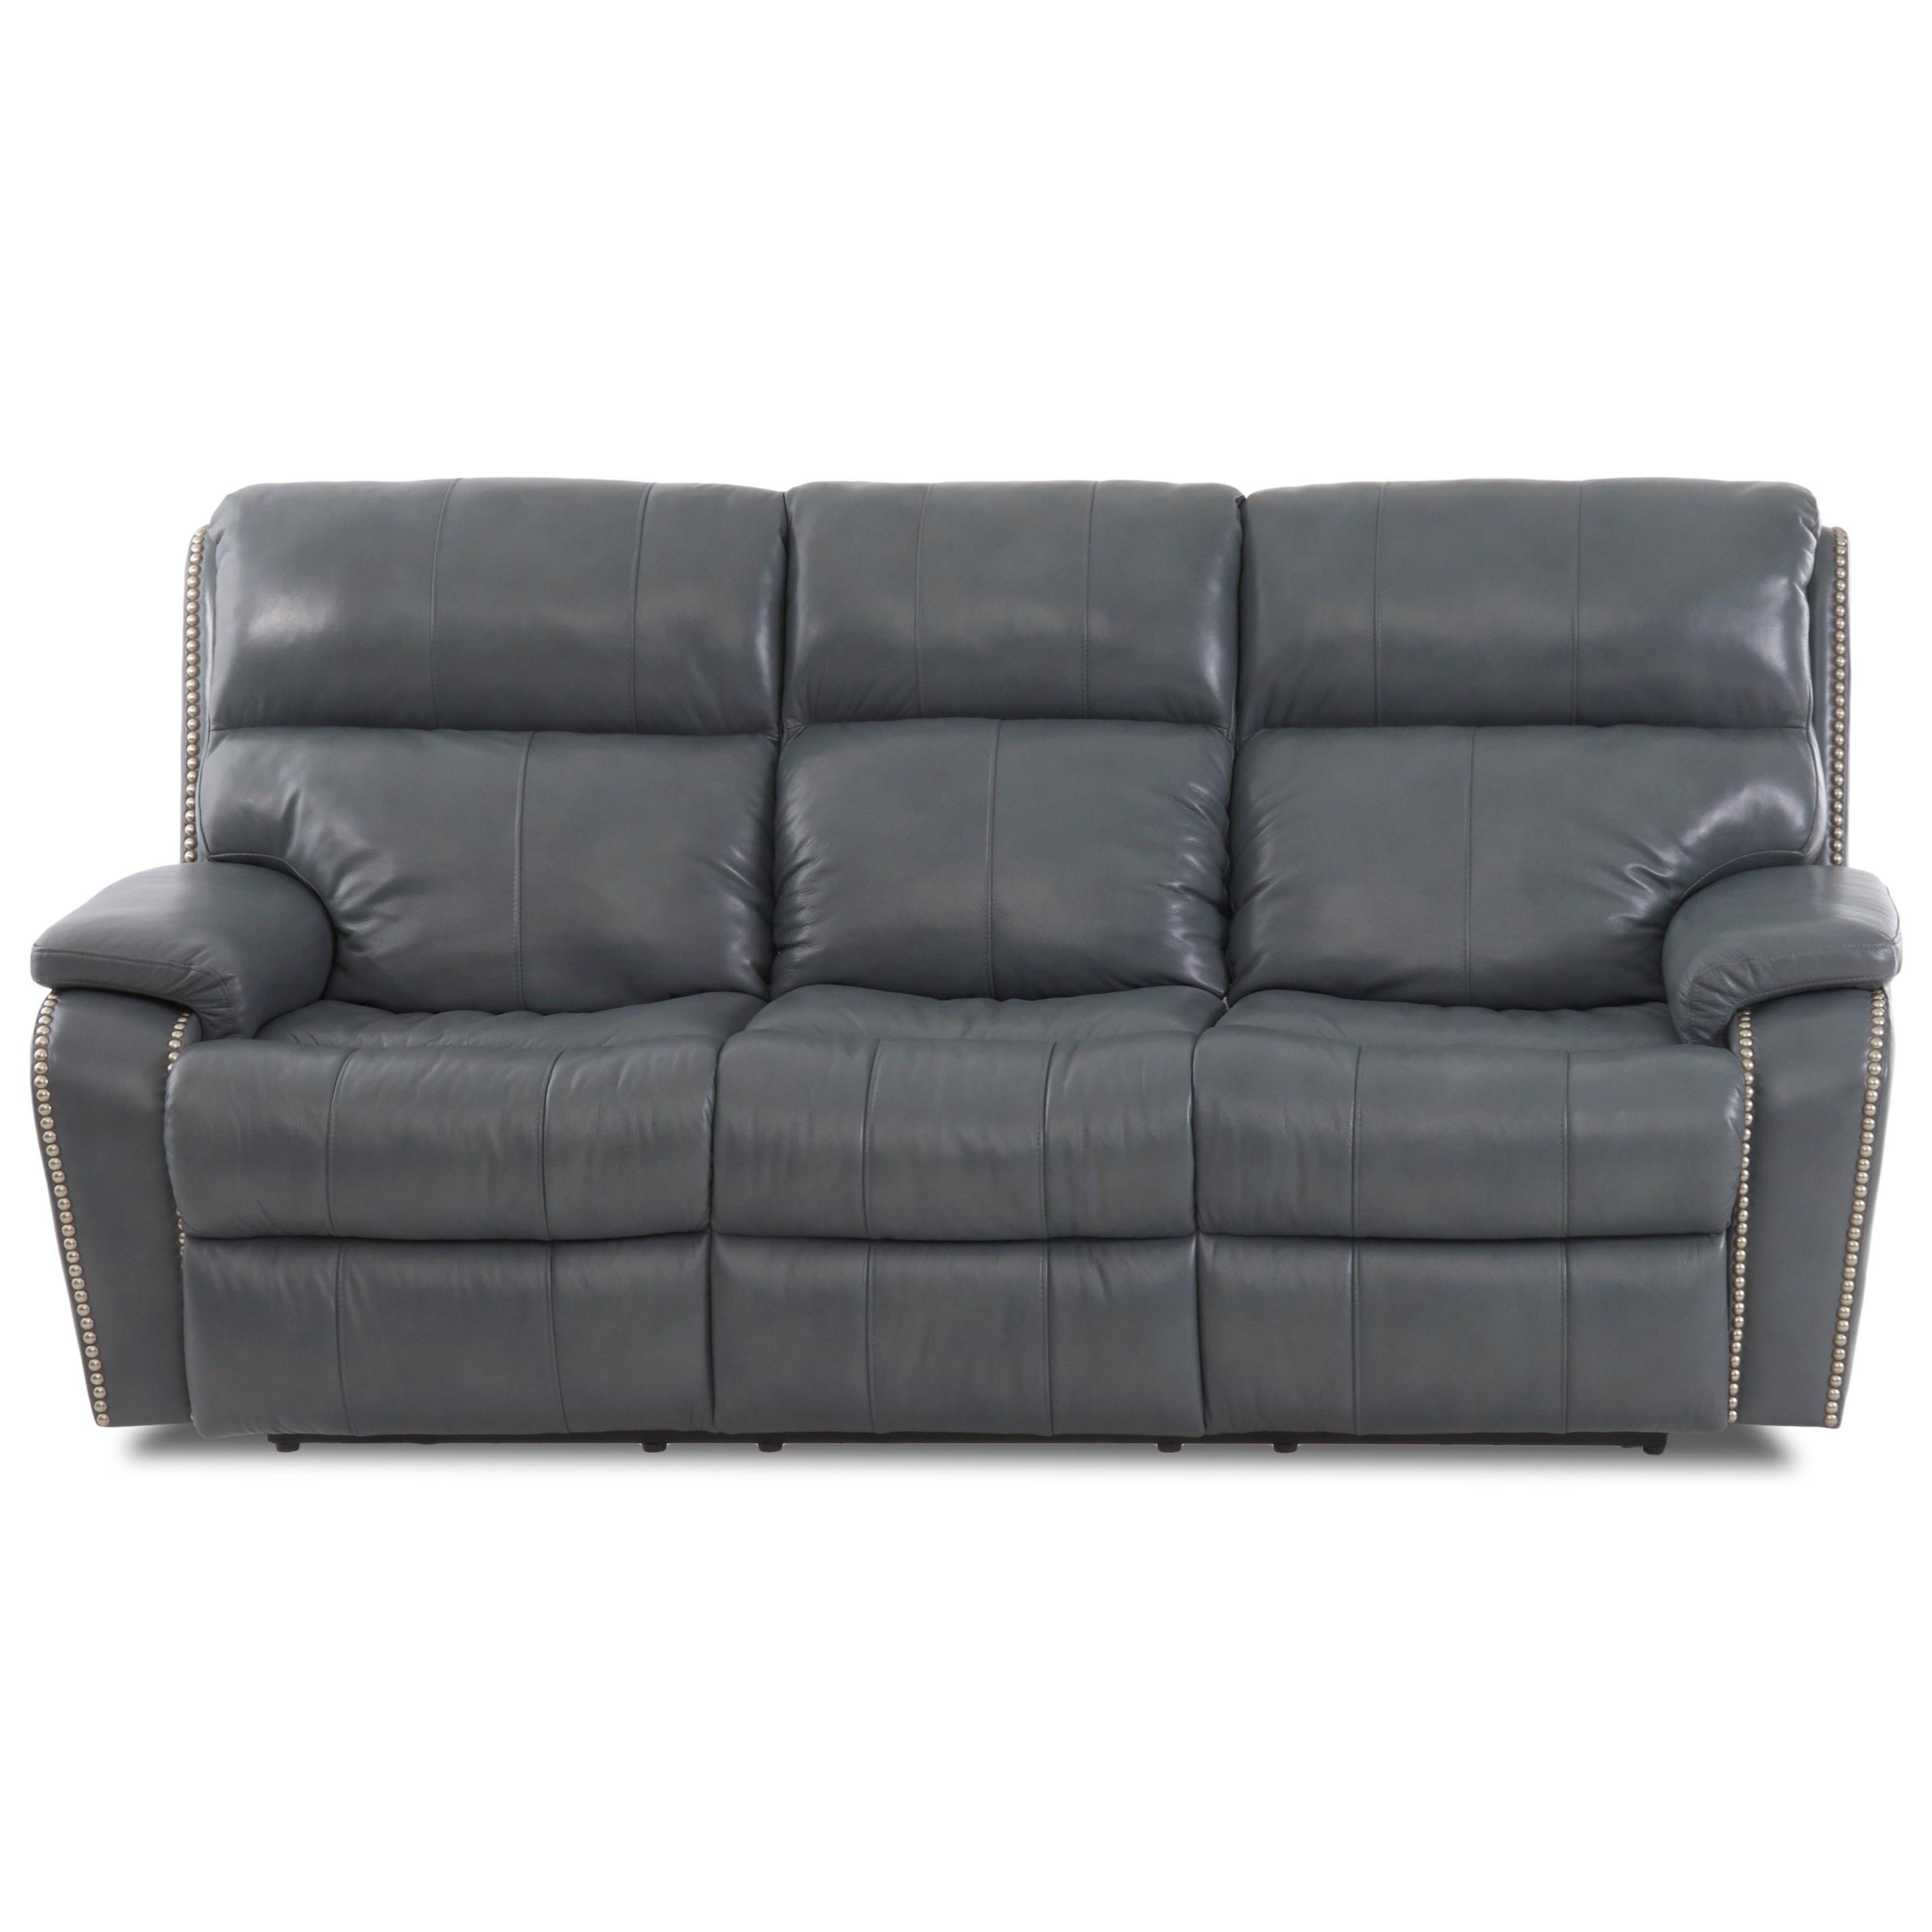 Power Reclining Sofa w/ Nails